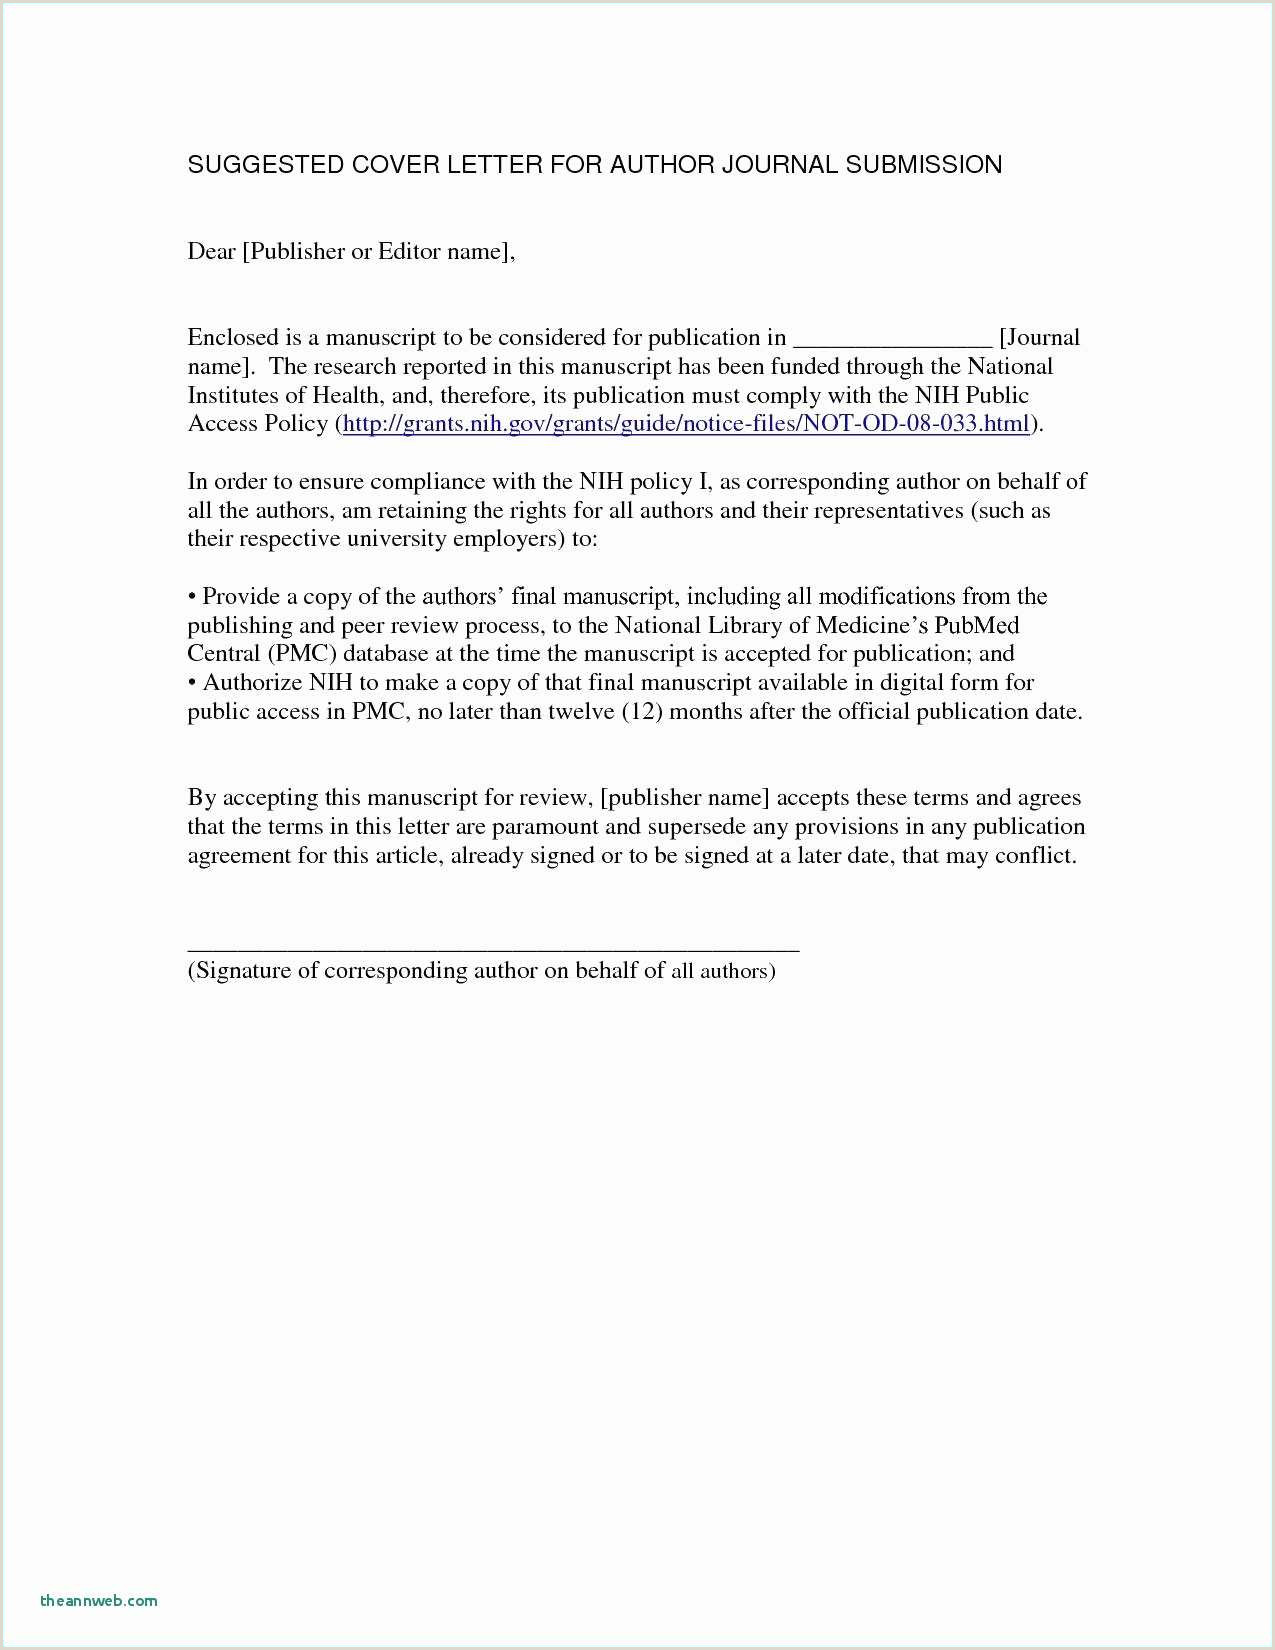 Civil Engineering Internship Resume 11 12 Sample Resume For Civil Engineer Internship